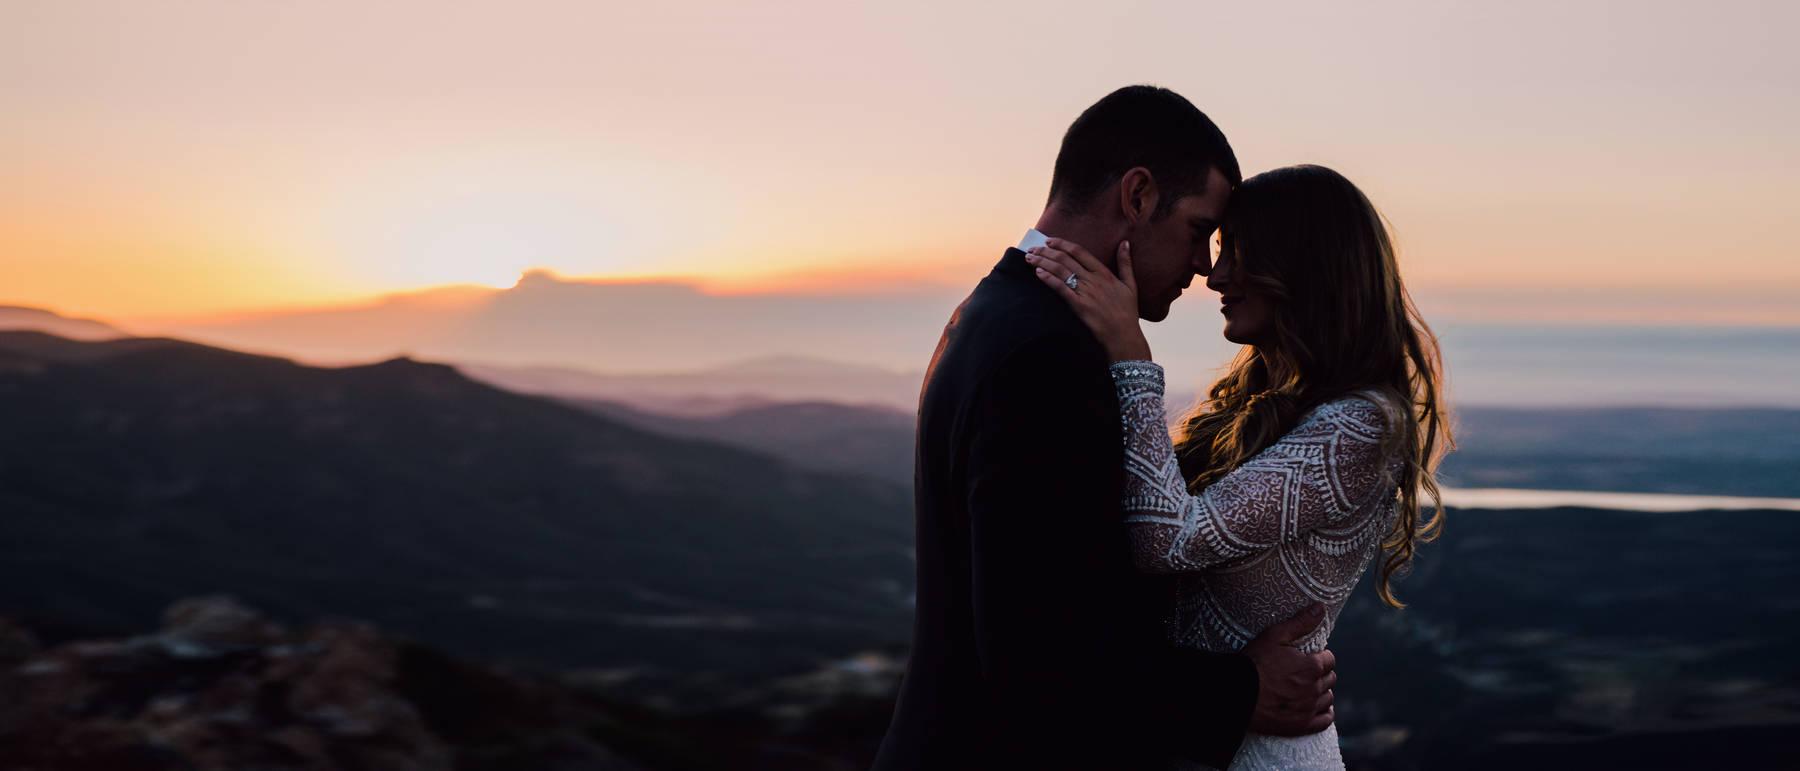 johnandjoseph-wedding-photographer-hz-slider-183